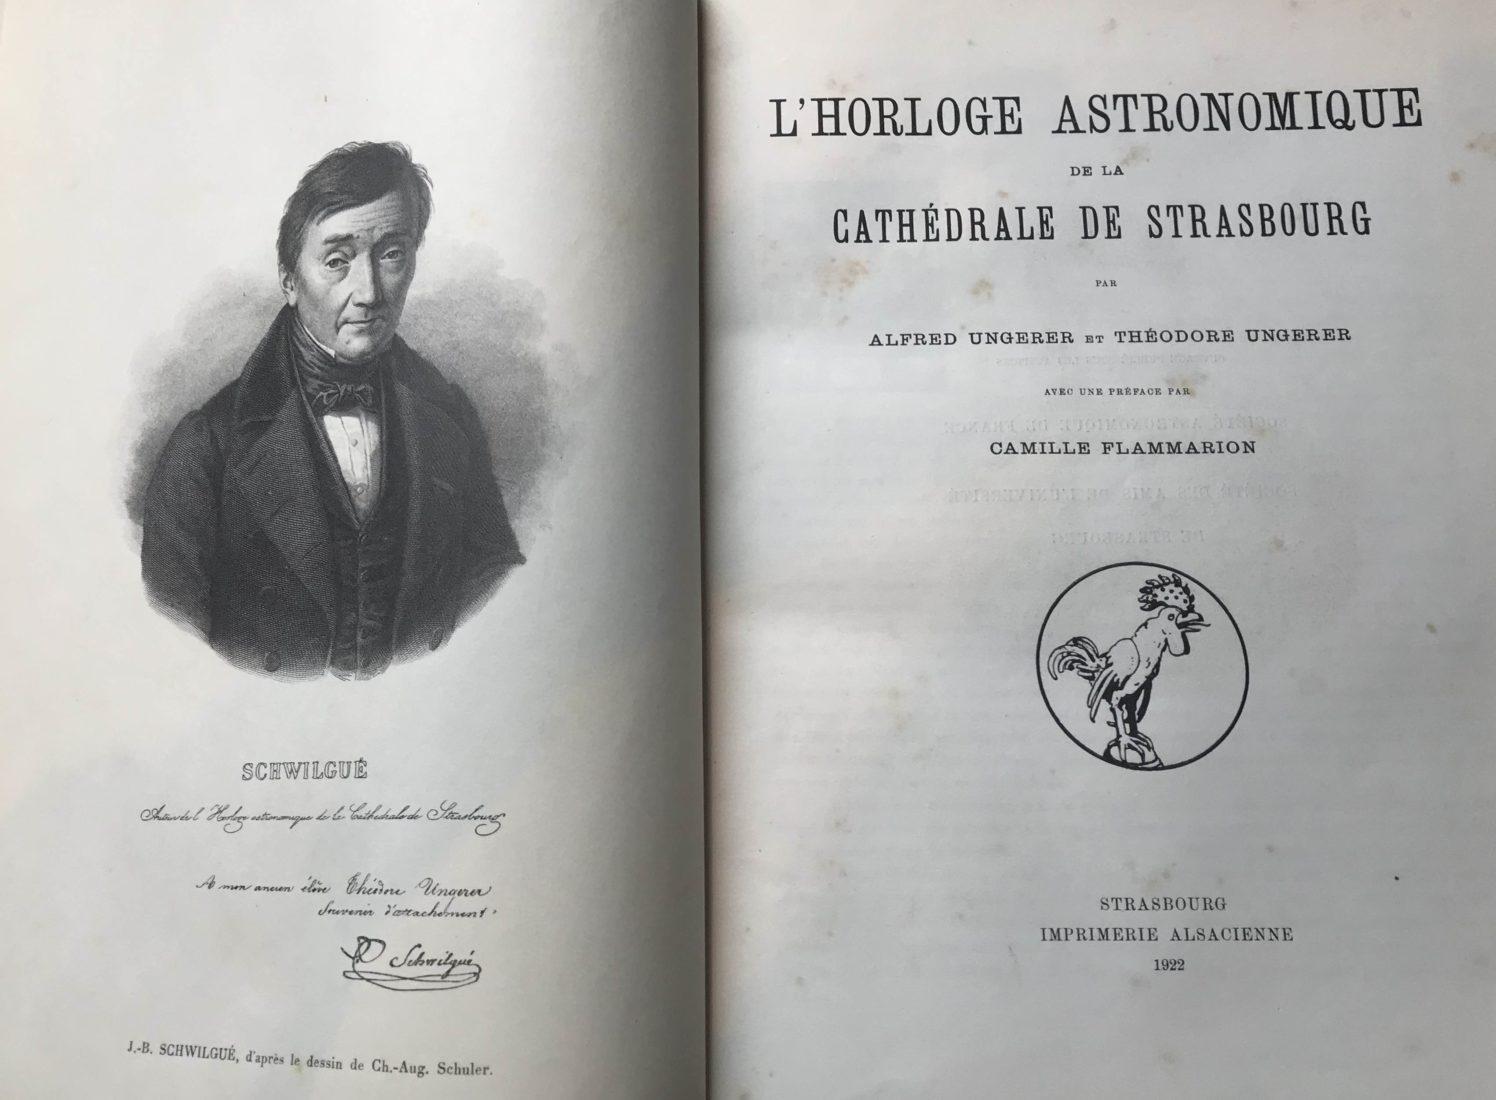 Horloge astronomique Cathédrale Strasbourg Alfred et Théodore Ungerer